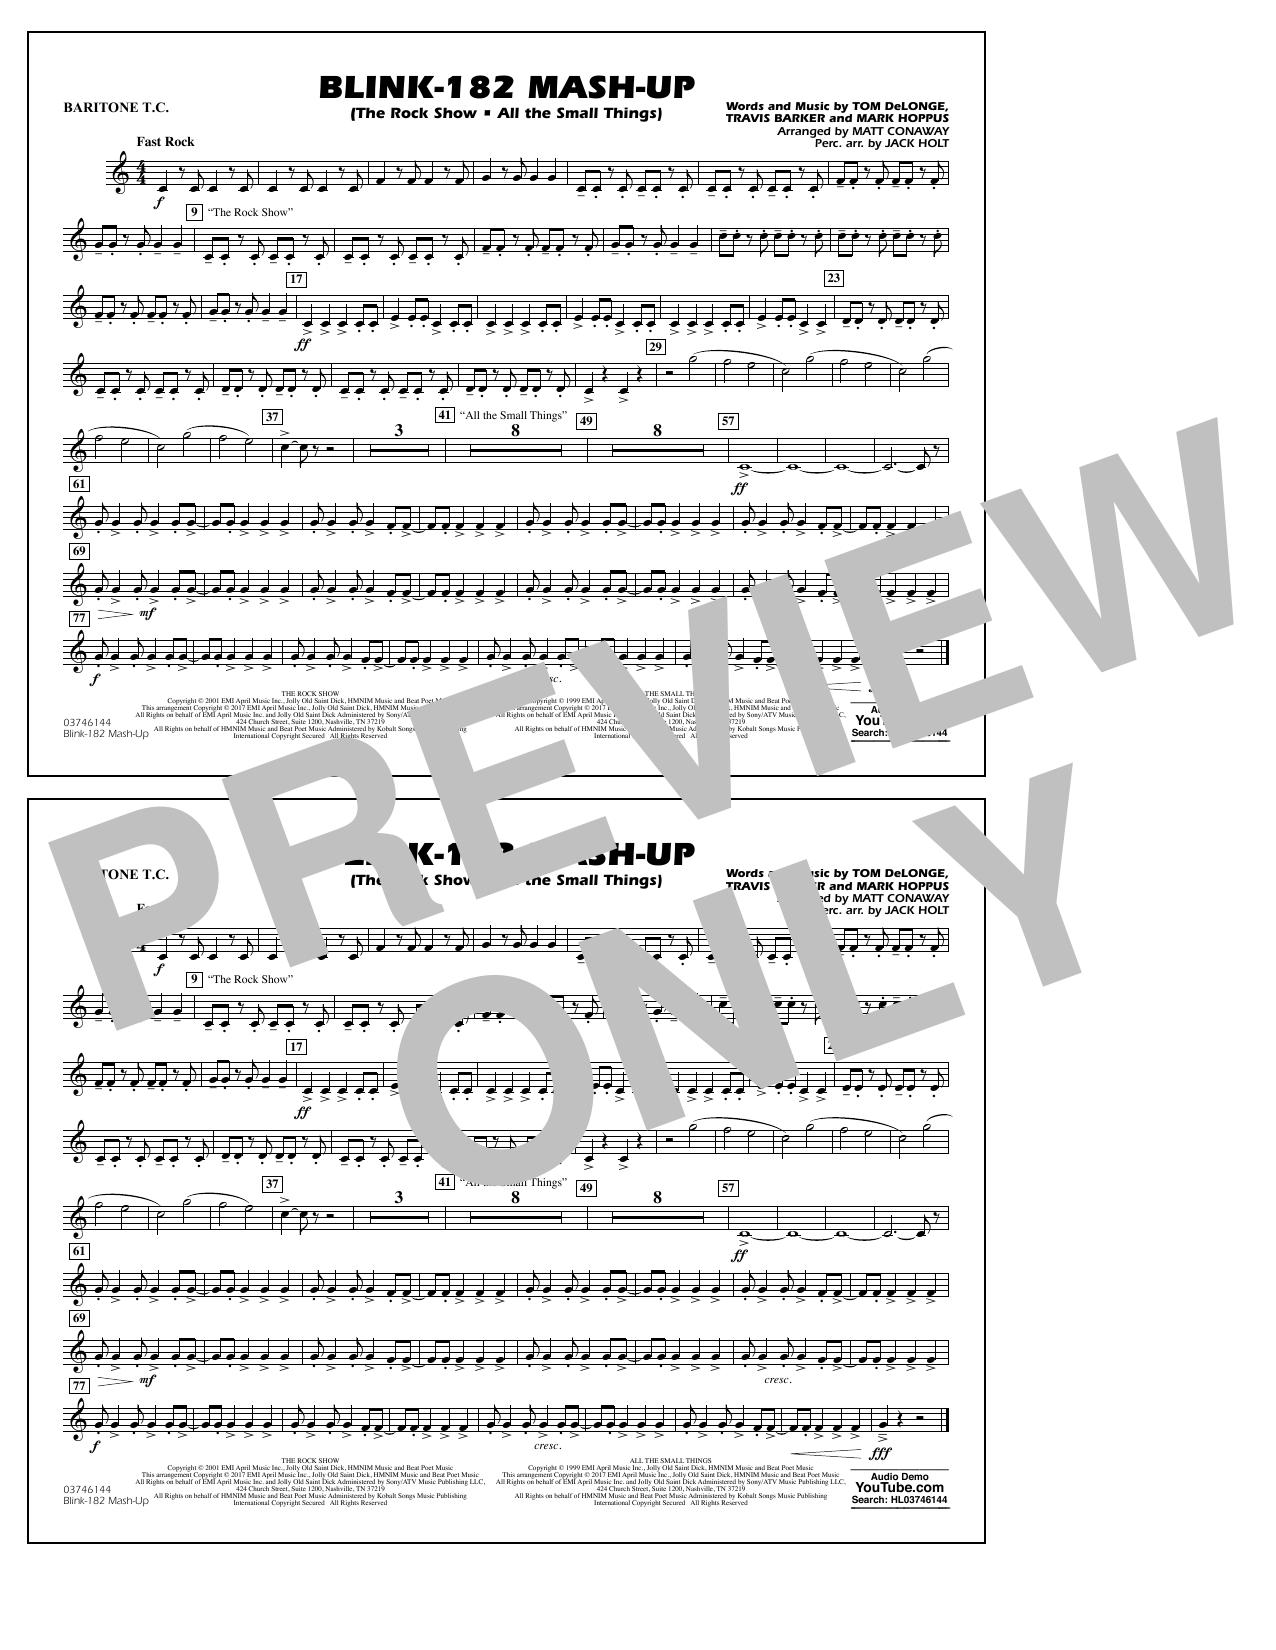 Blink-182 Mash-Up - Baritone T.C. Sheet Music